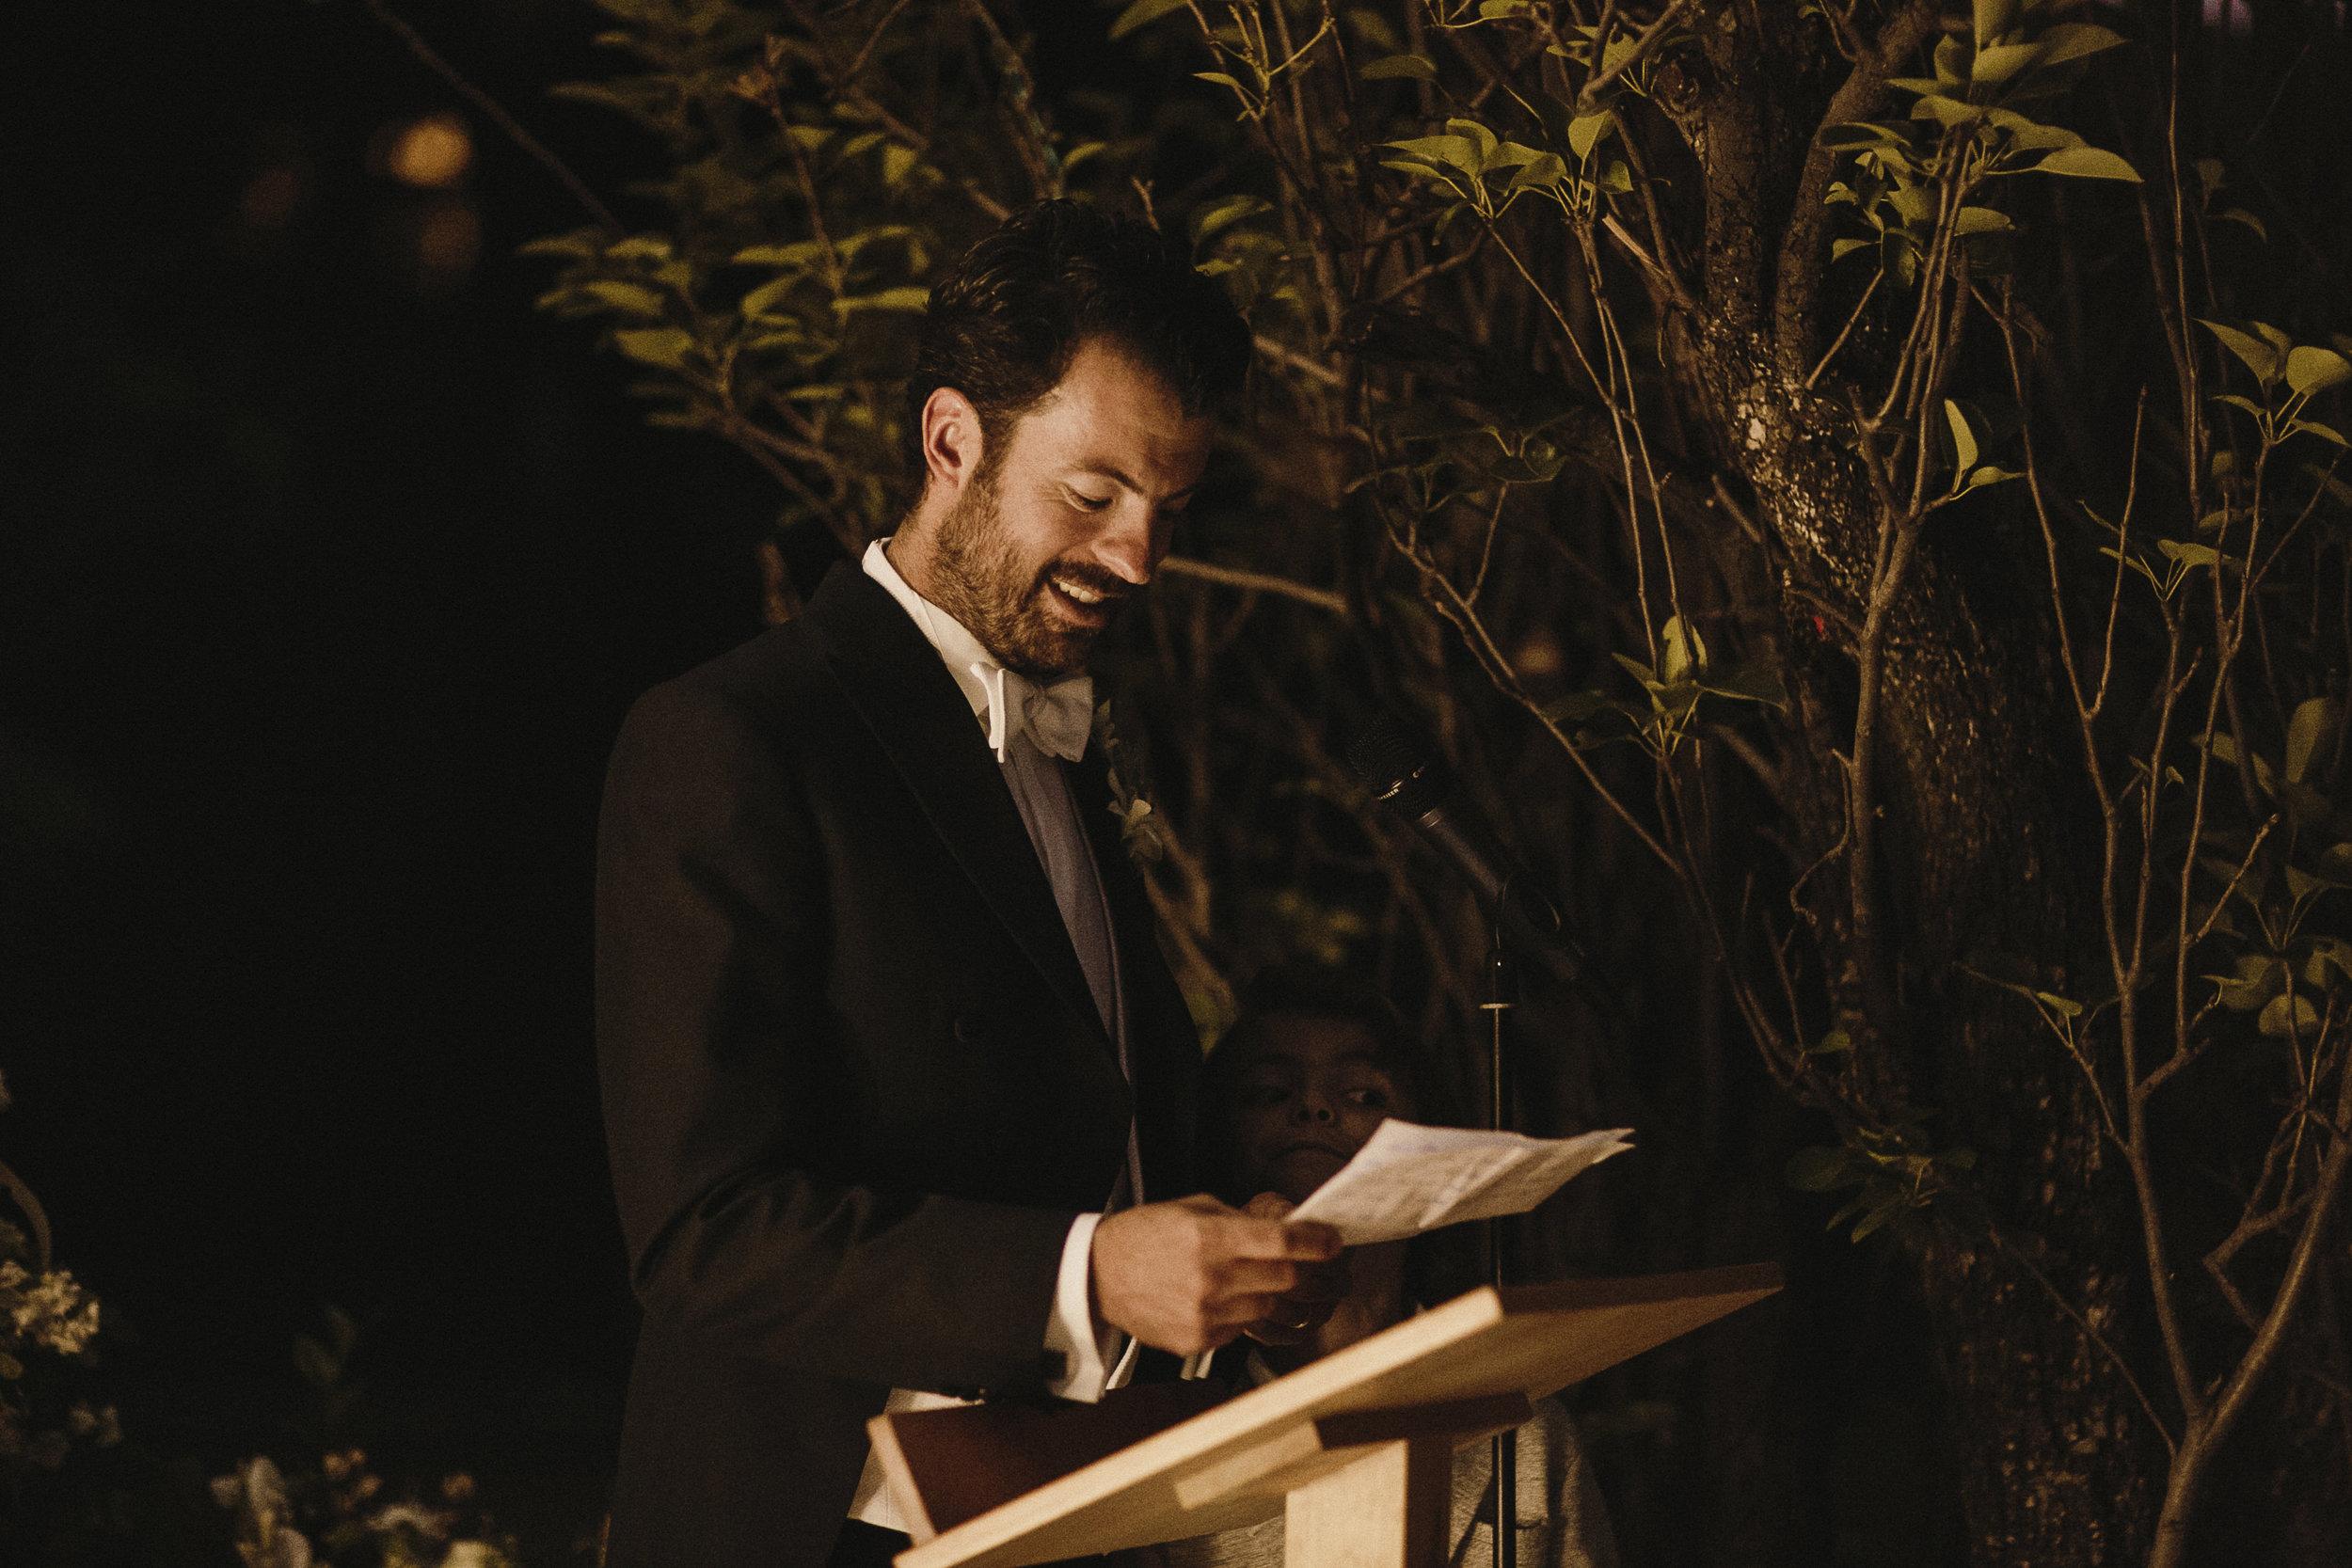 alfonso_flores_destination_wedding_photogrpahy_paola_alonso-663.JPG